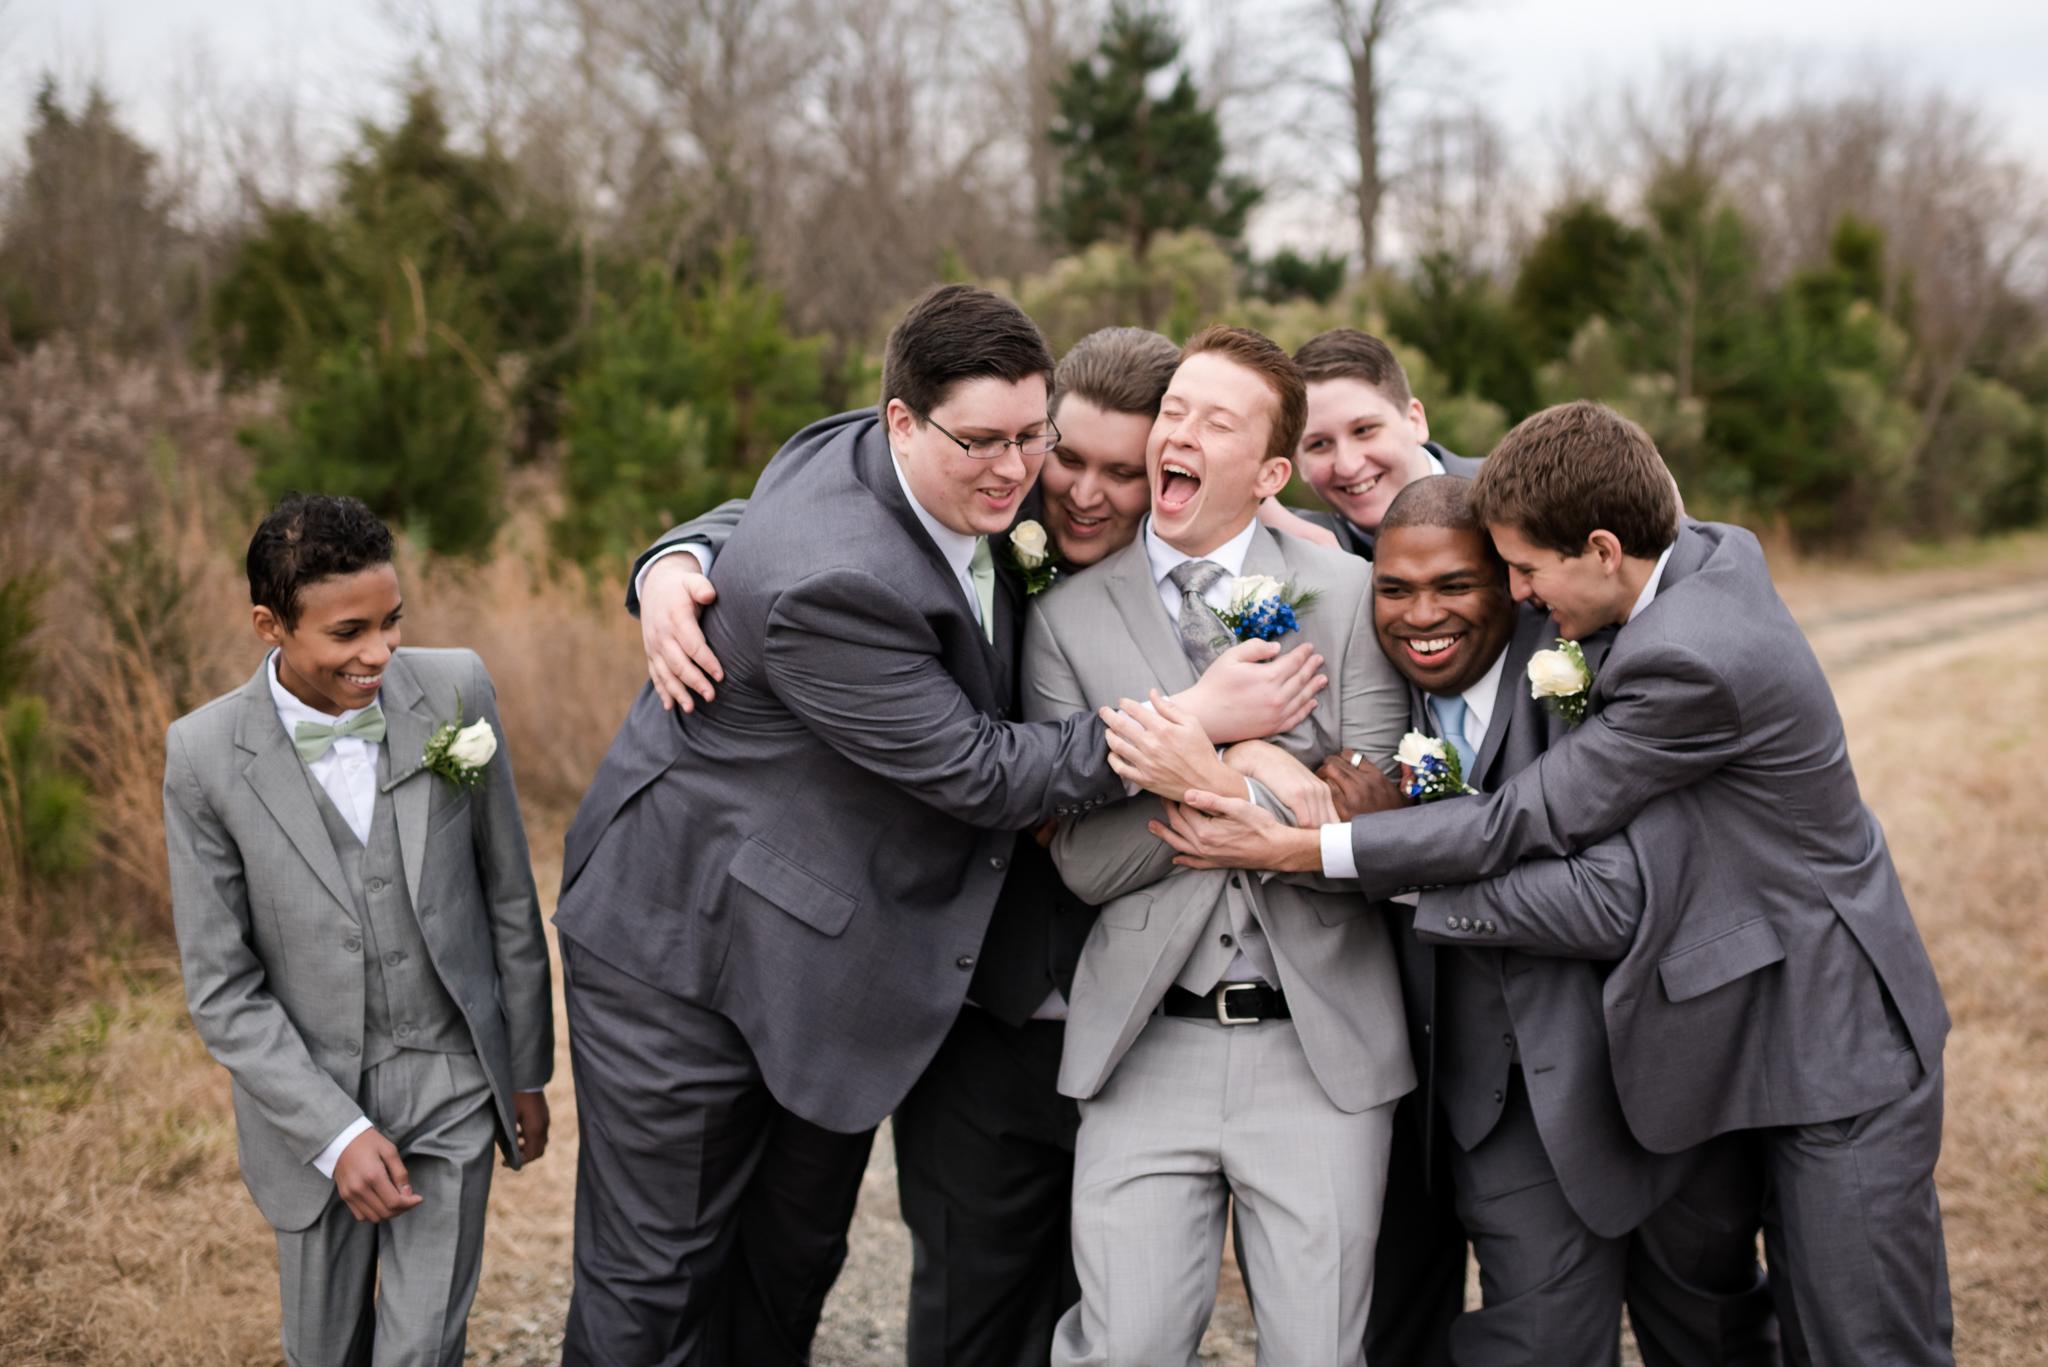 gibsonville-wedding-photography-012.jpg